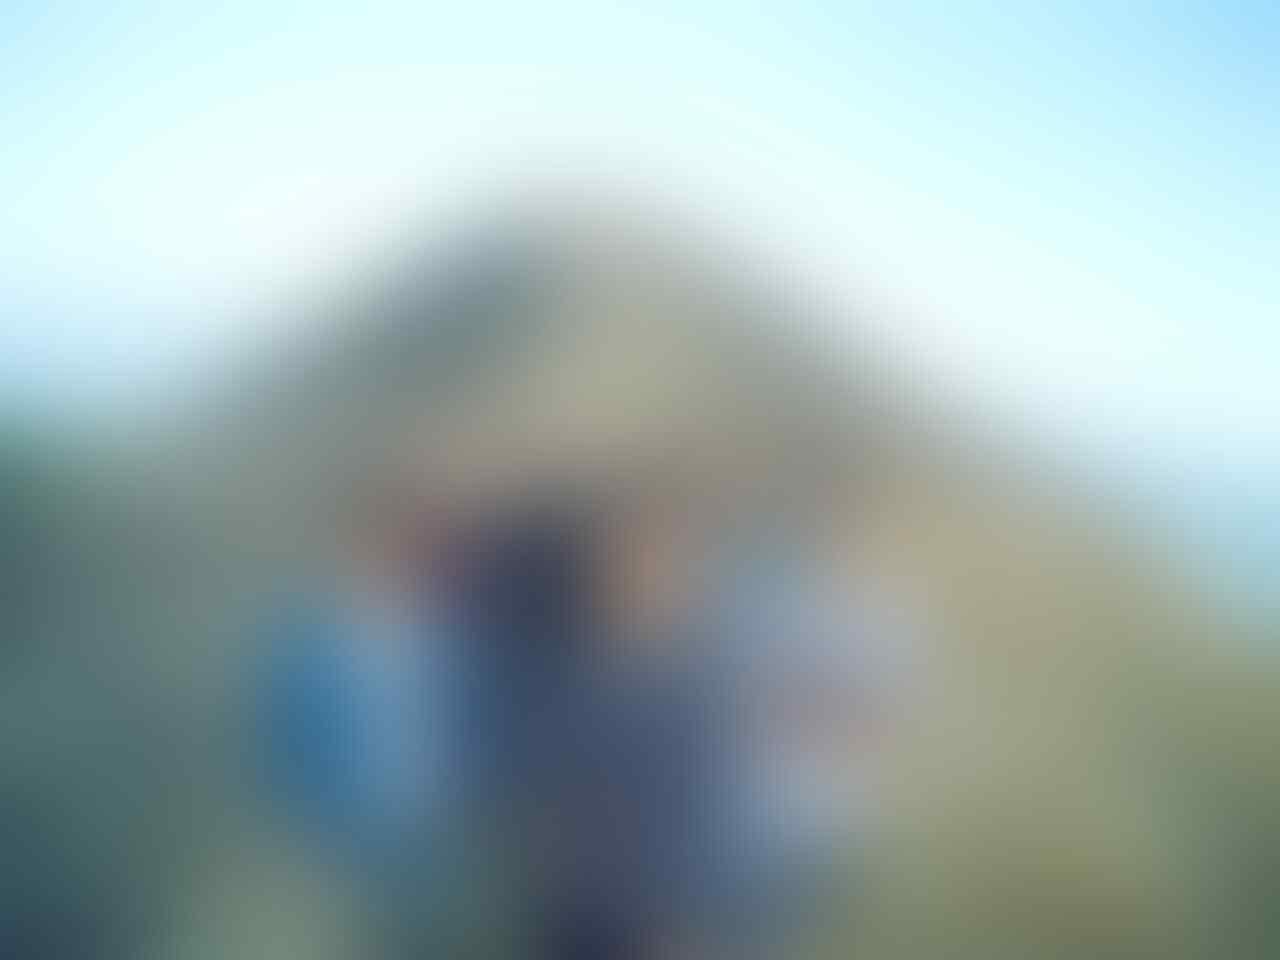 [Keliling Indonesia] PULAU KENAWA : PETUALANGAN DI SURGA SUMBAWA